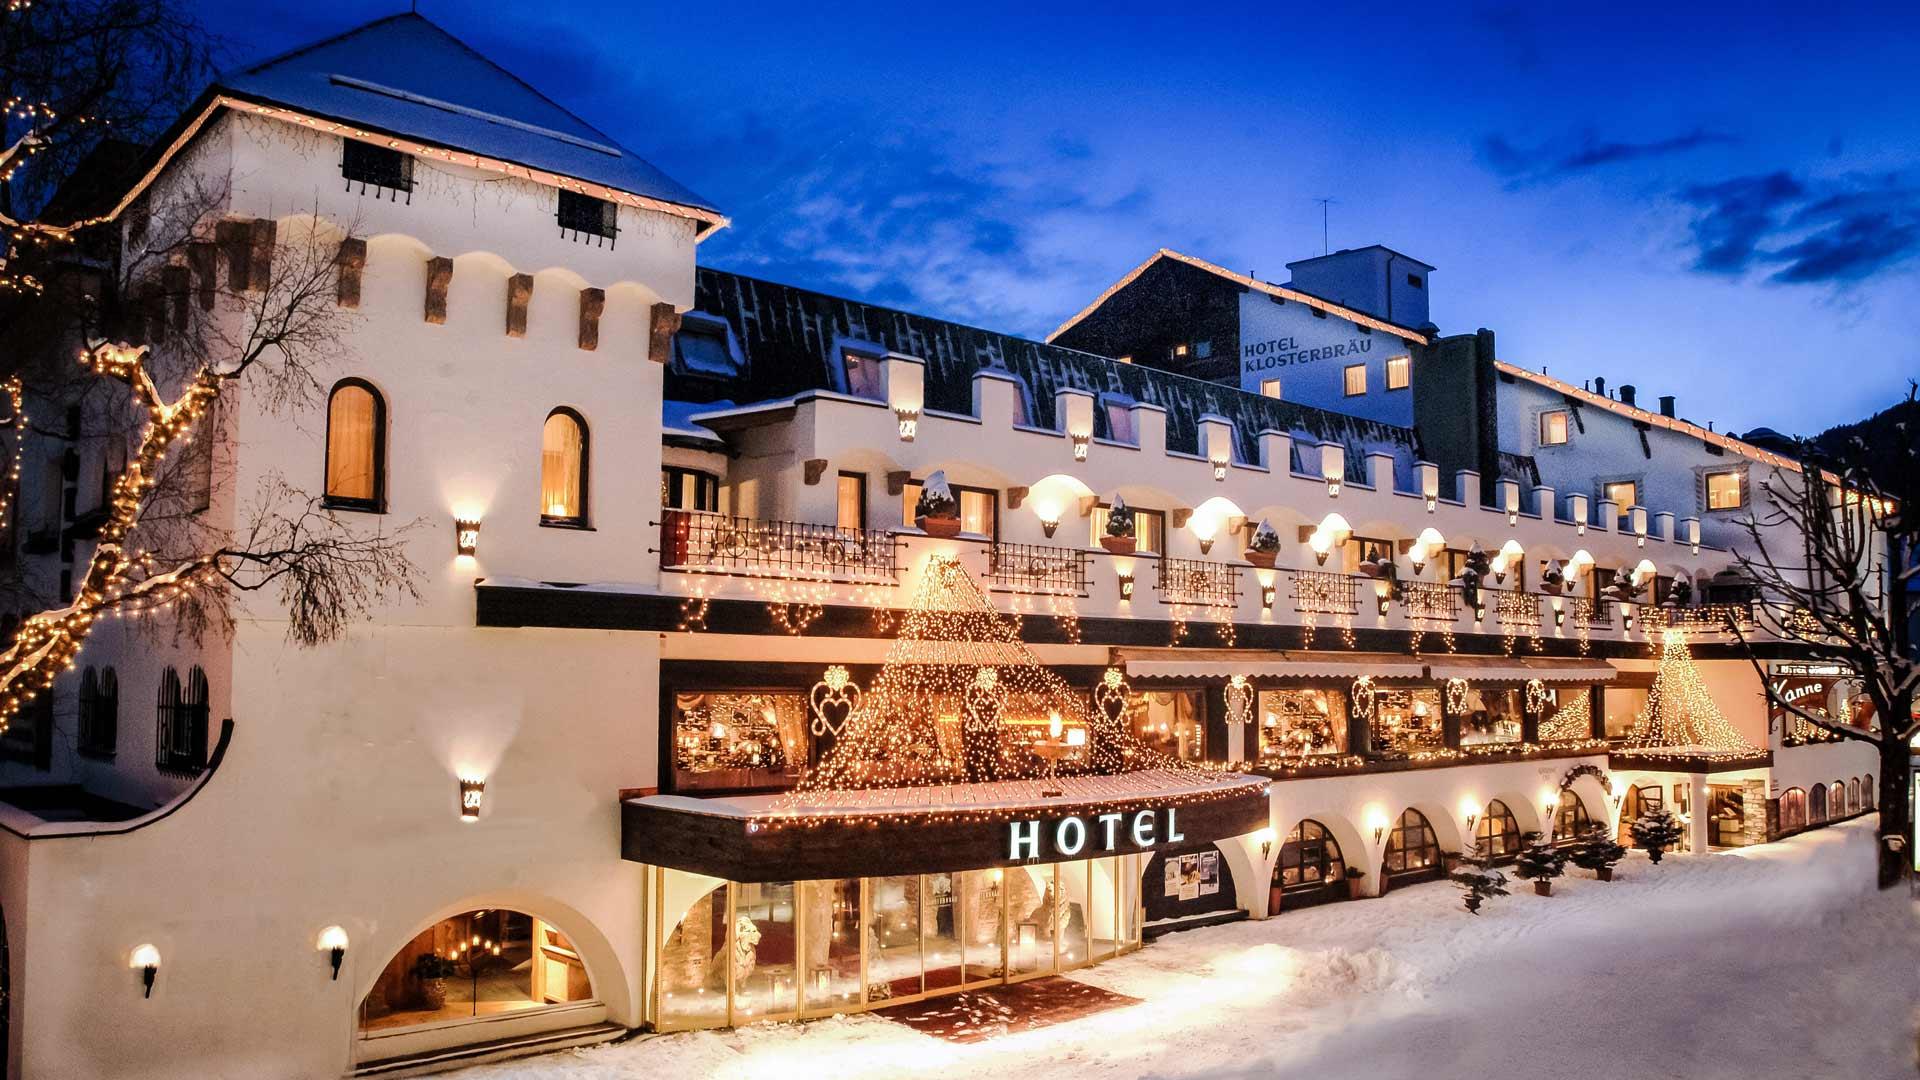 Hotel klostebrau di seefeld in tirolo ville casali for Design hotel seefeld